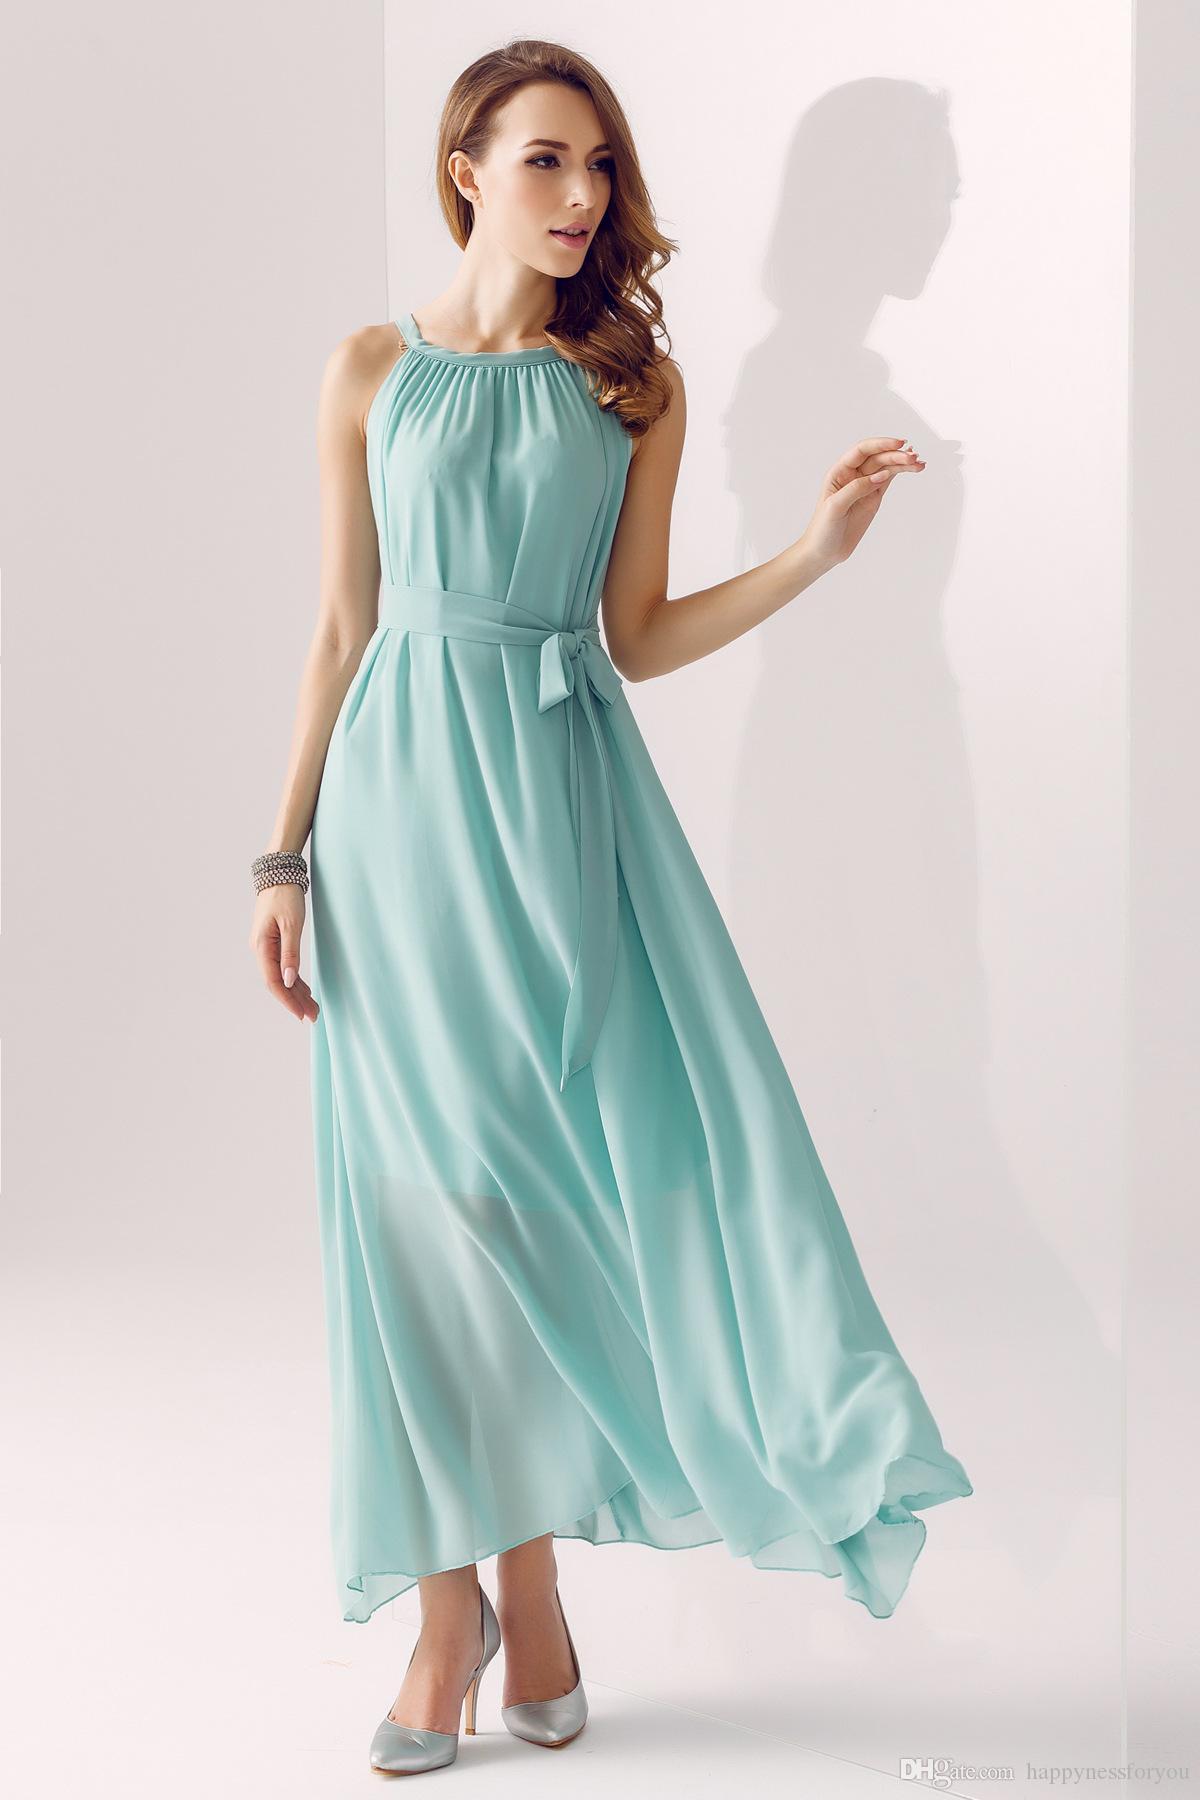 dresses fashion new hot simple Chiffon dress White, blue, orange ...